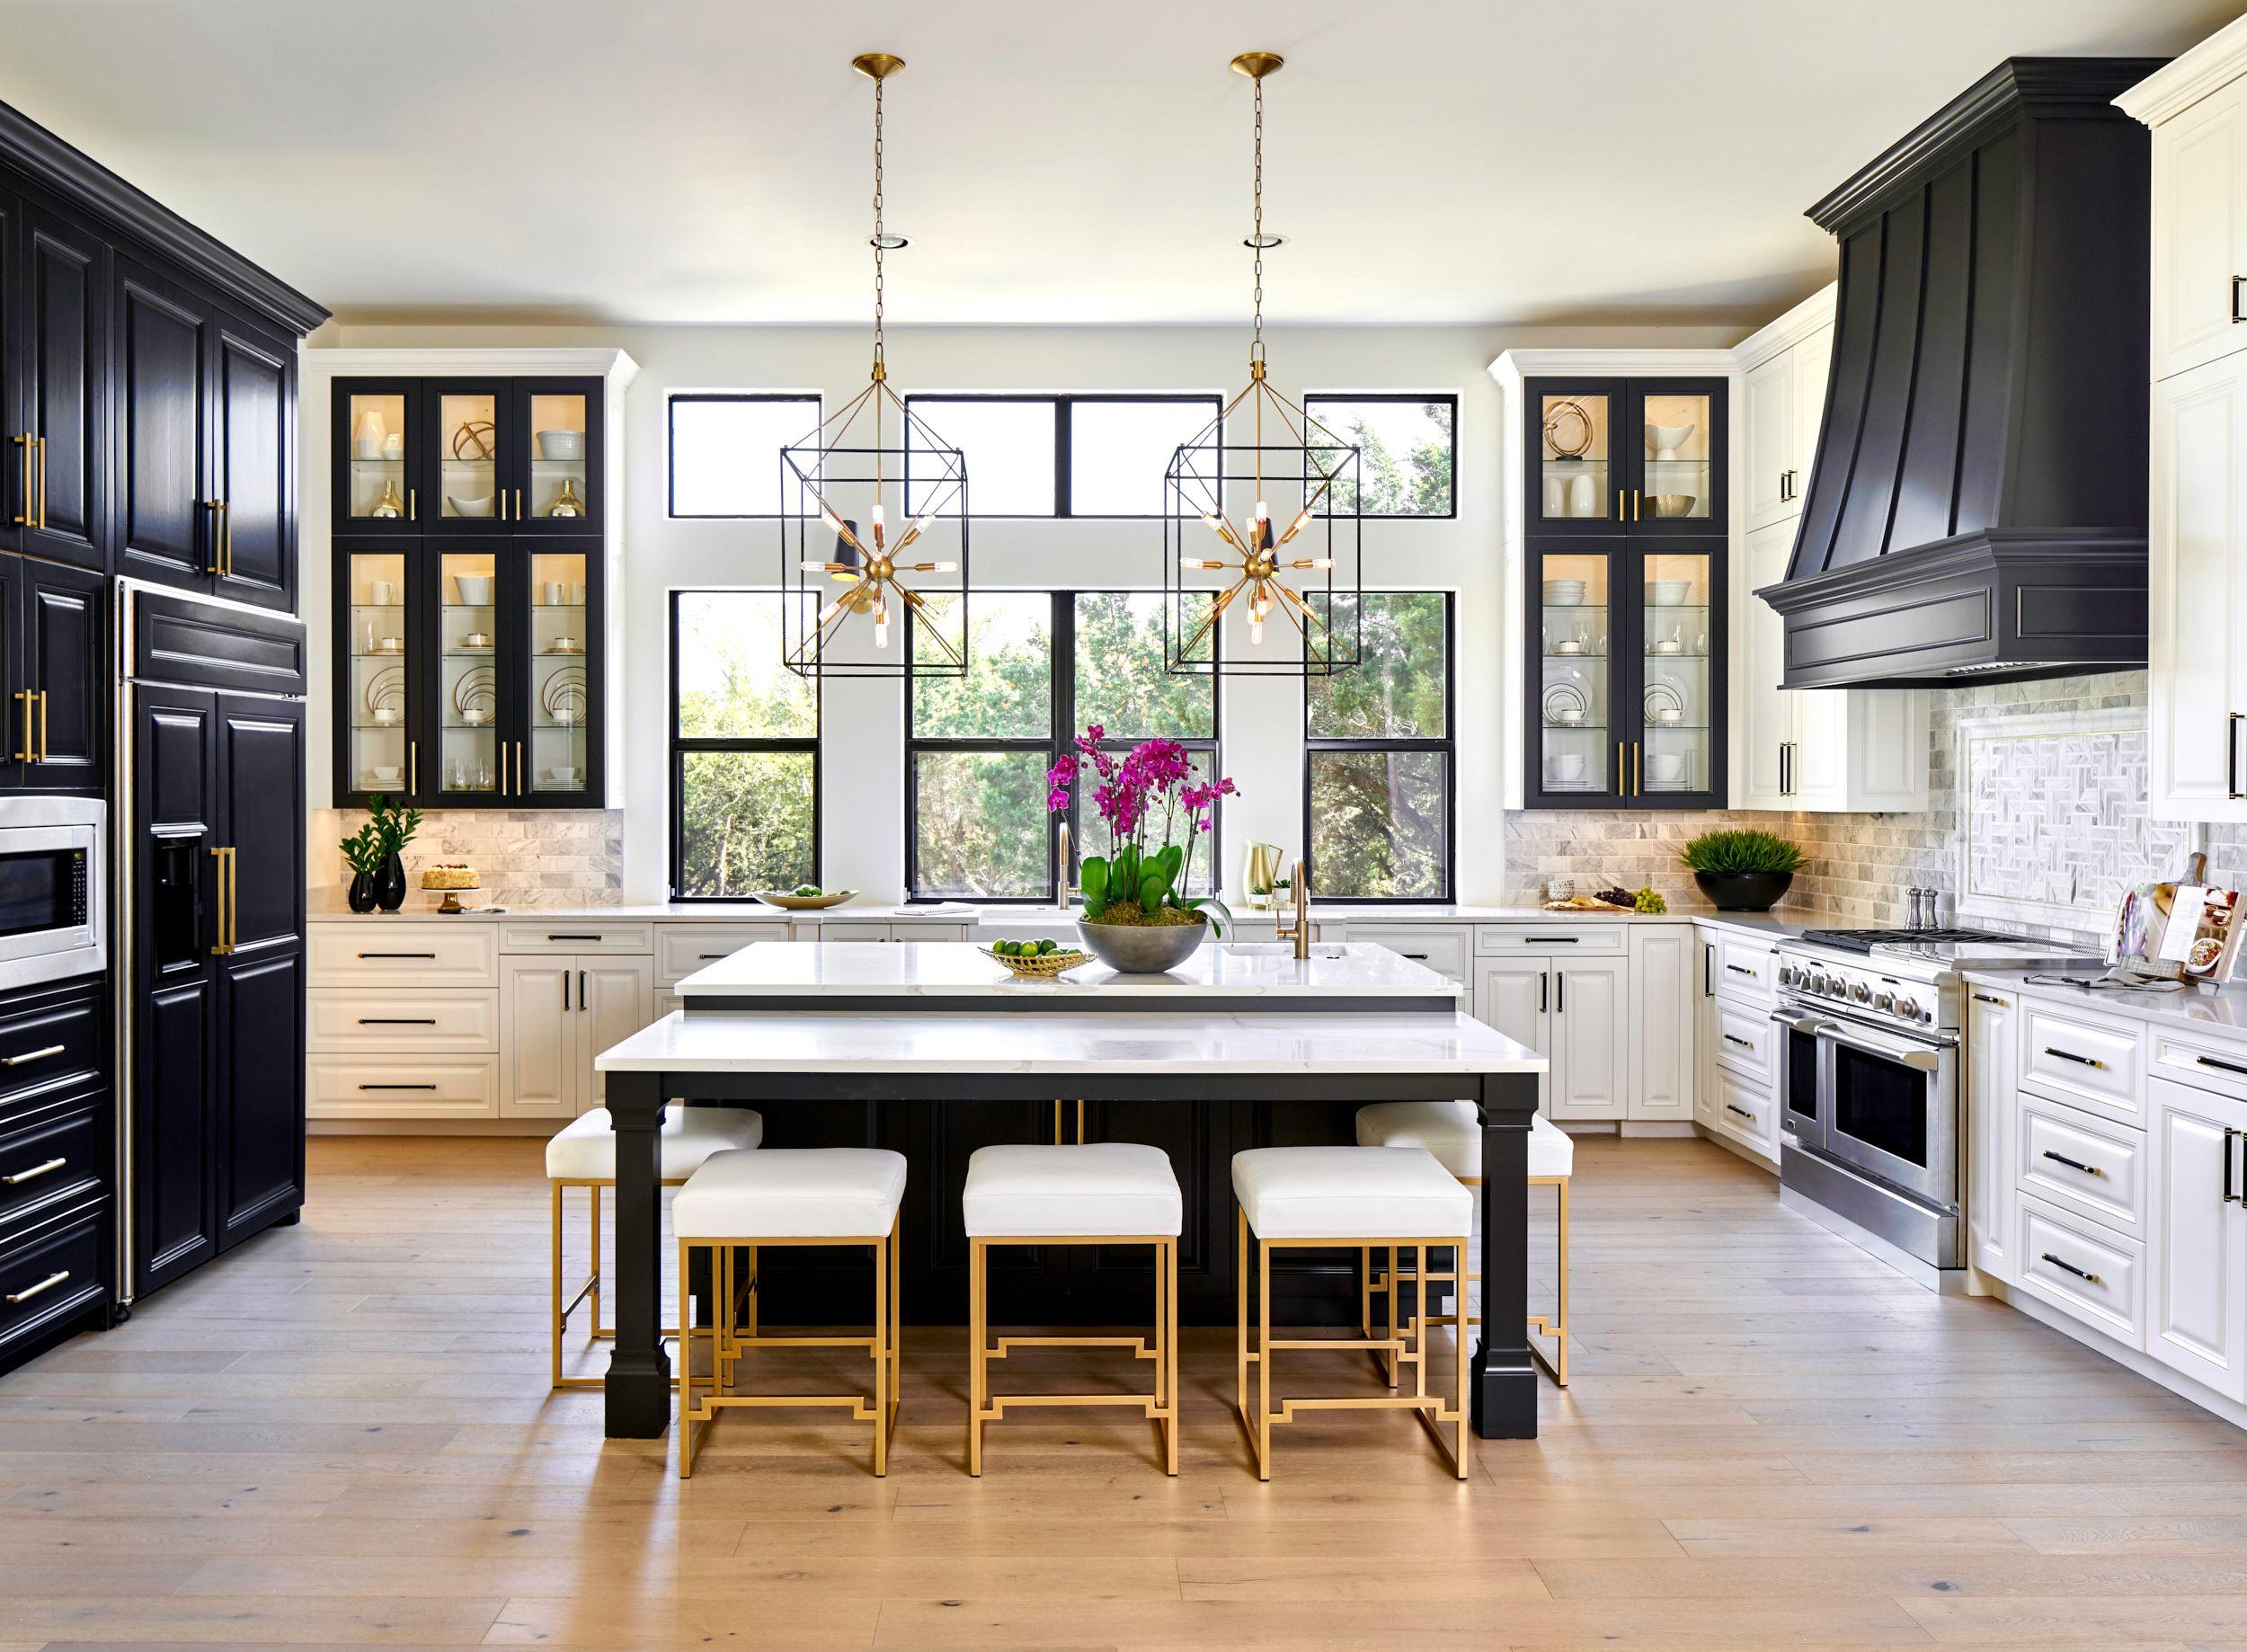 Best Black White Gold Transitional Kitchen With European 400 x 300